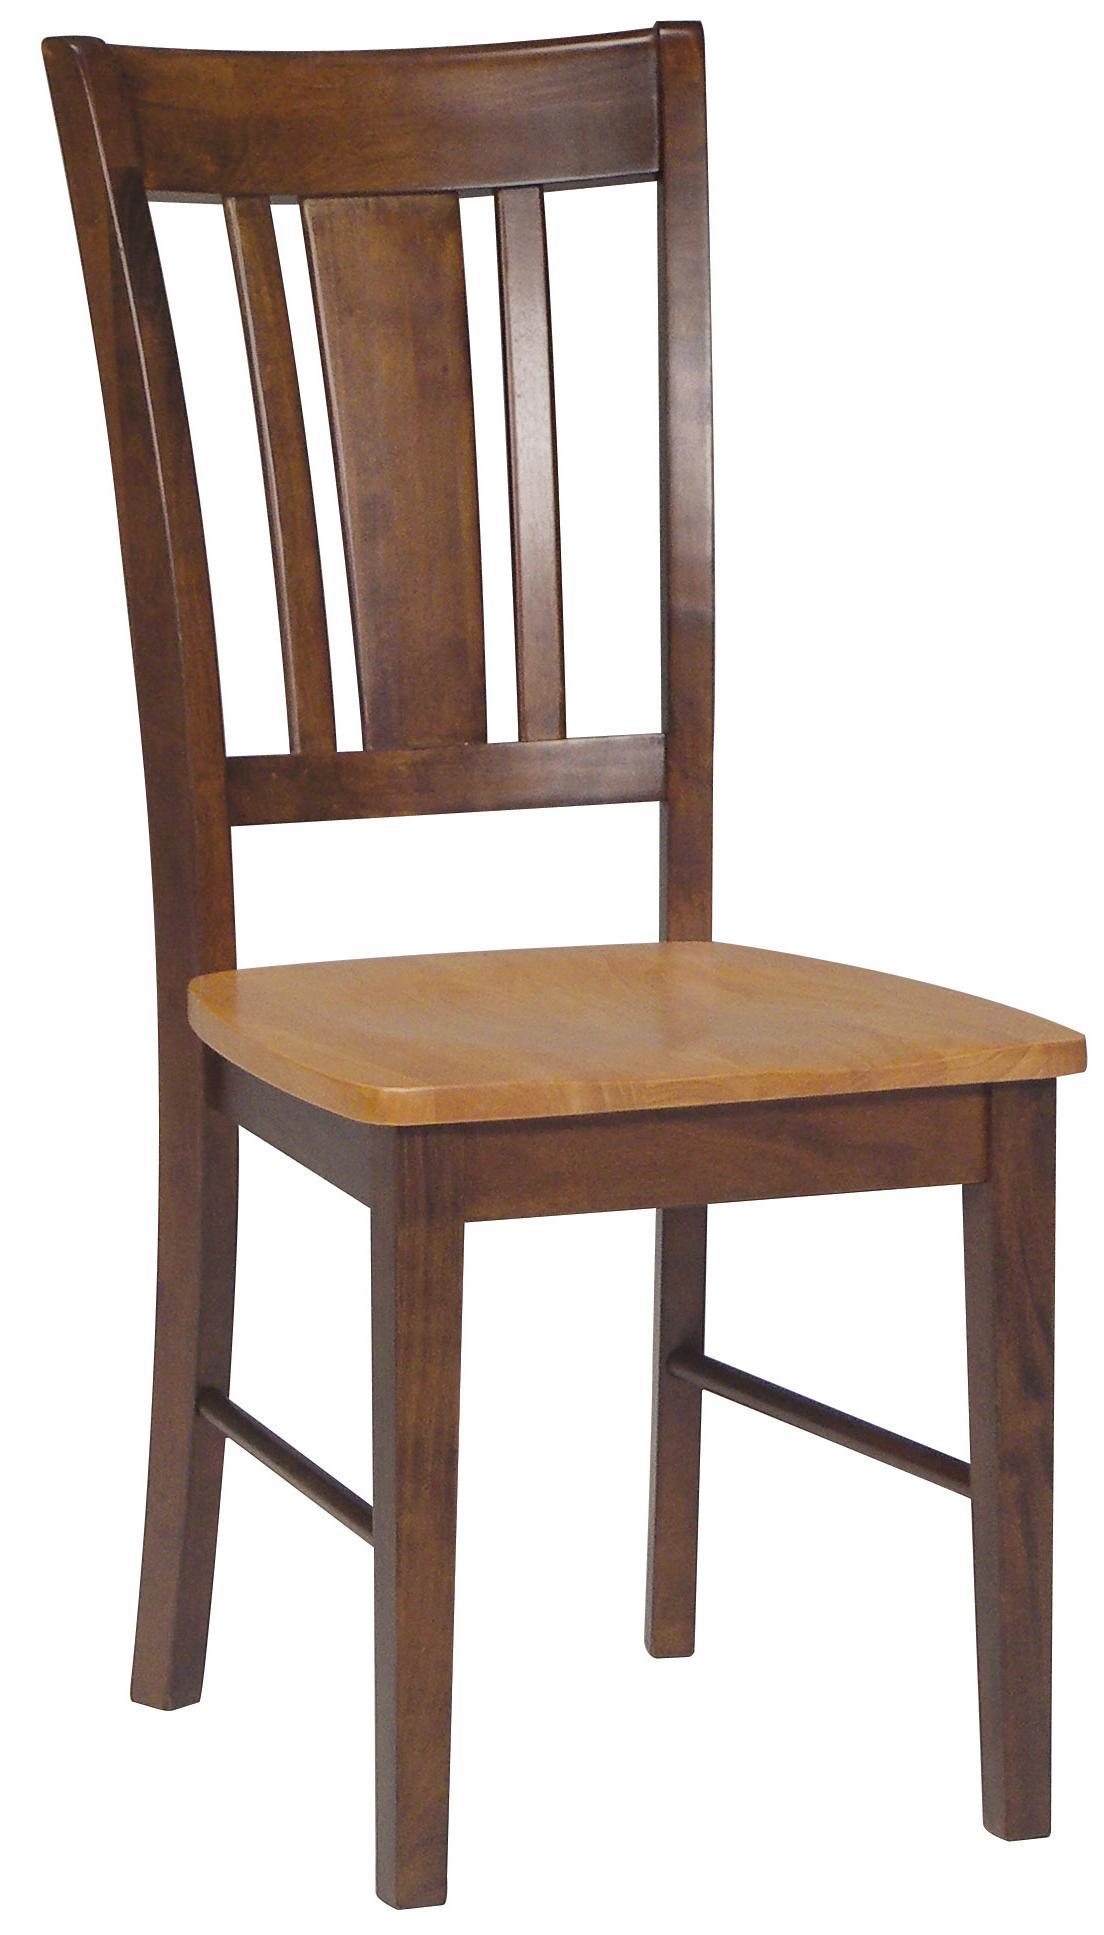 John Thomas Dining Essentials Splat Back Side Chair - Item Number: C58-10